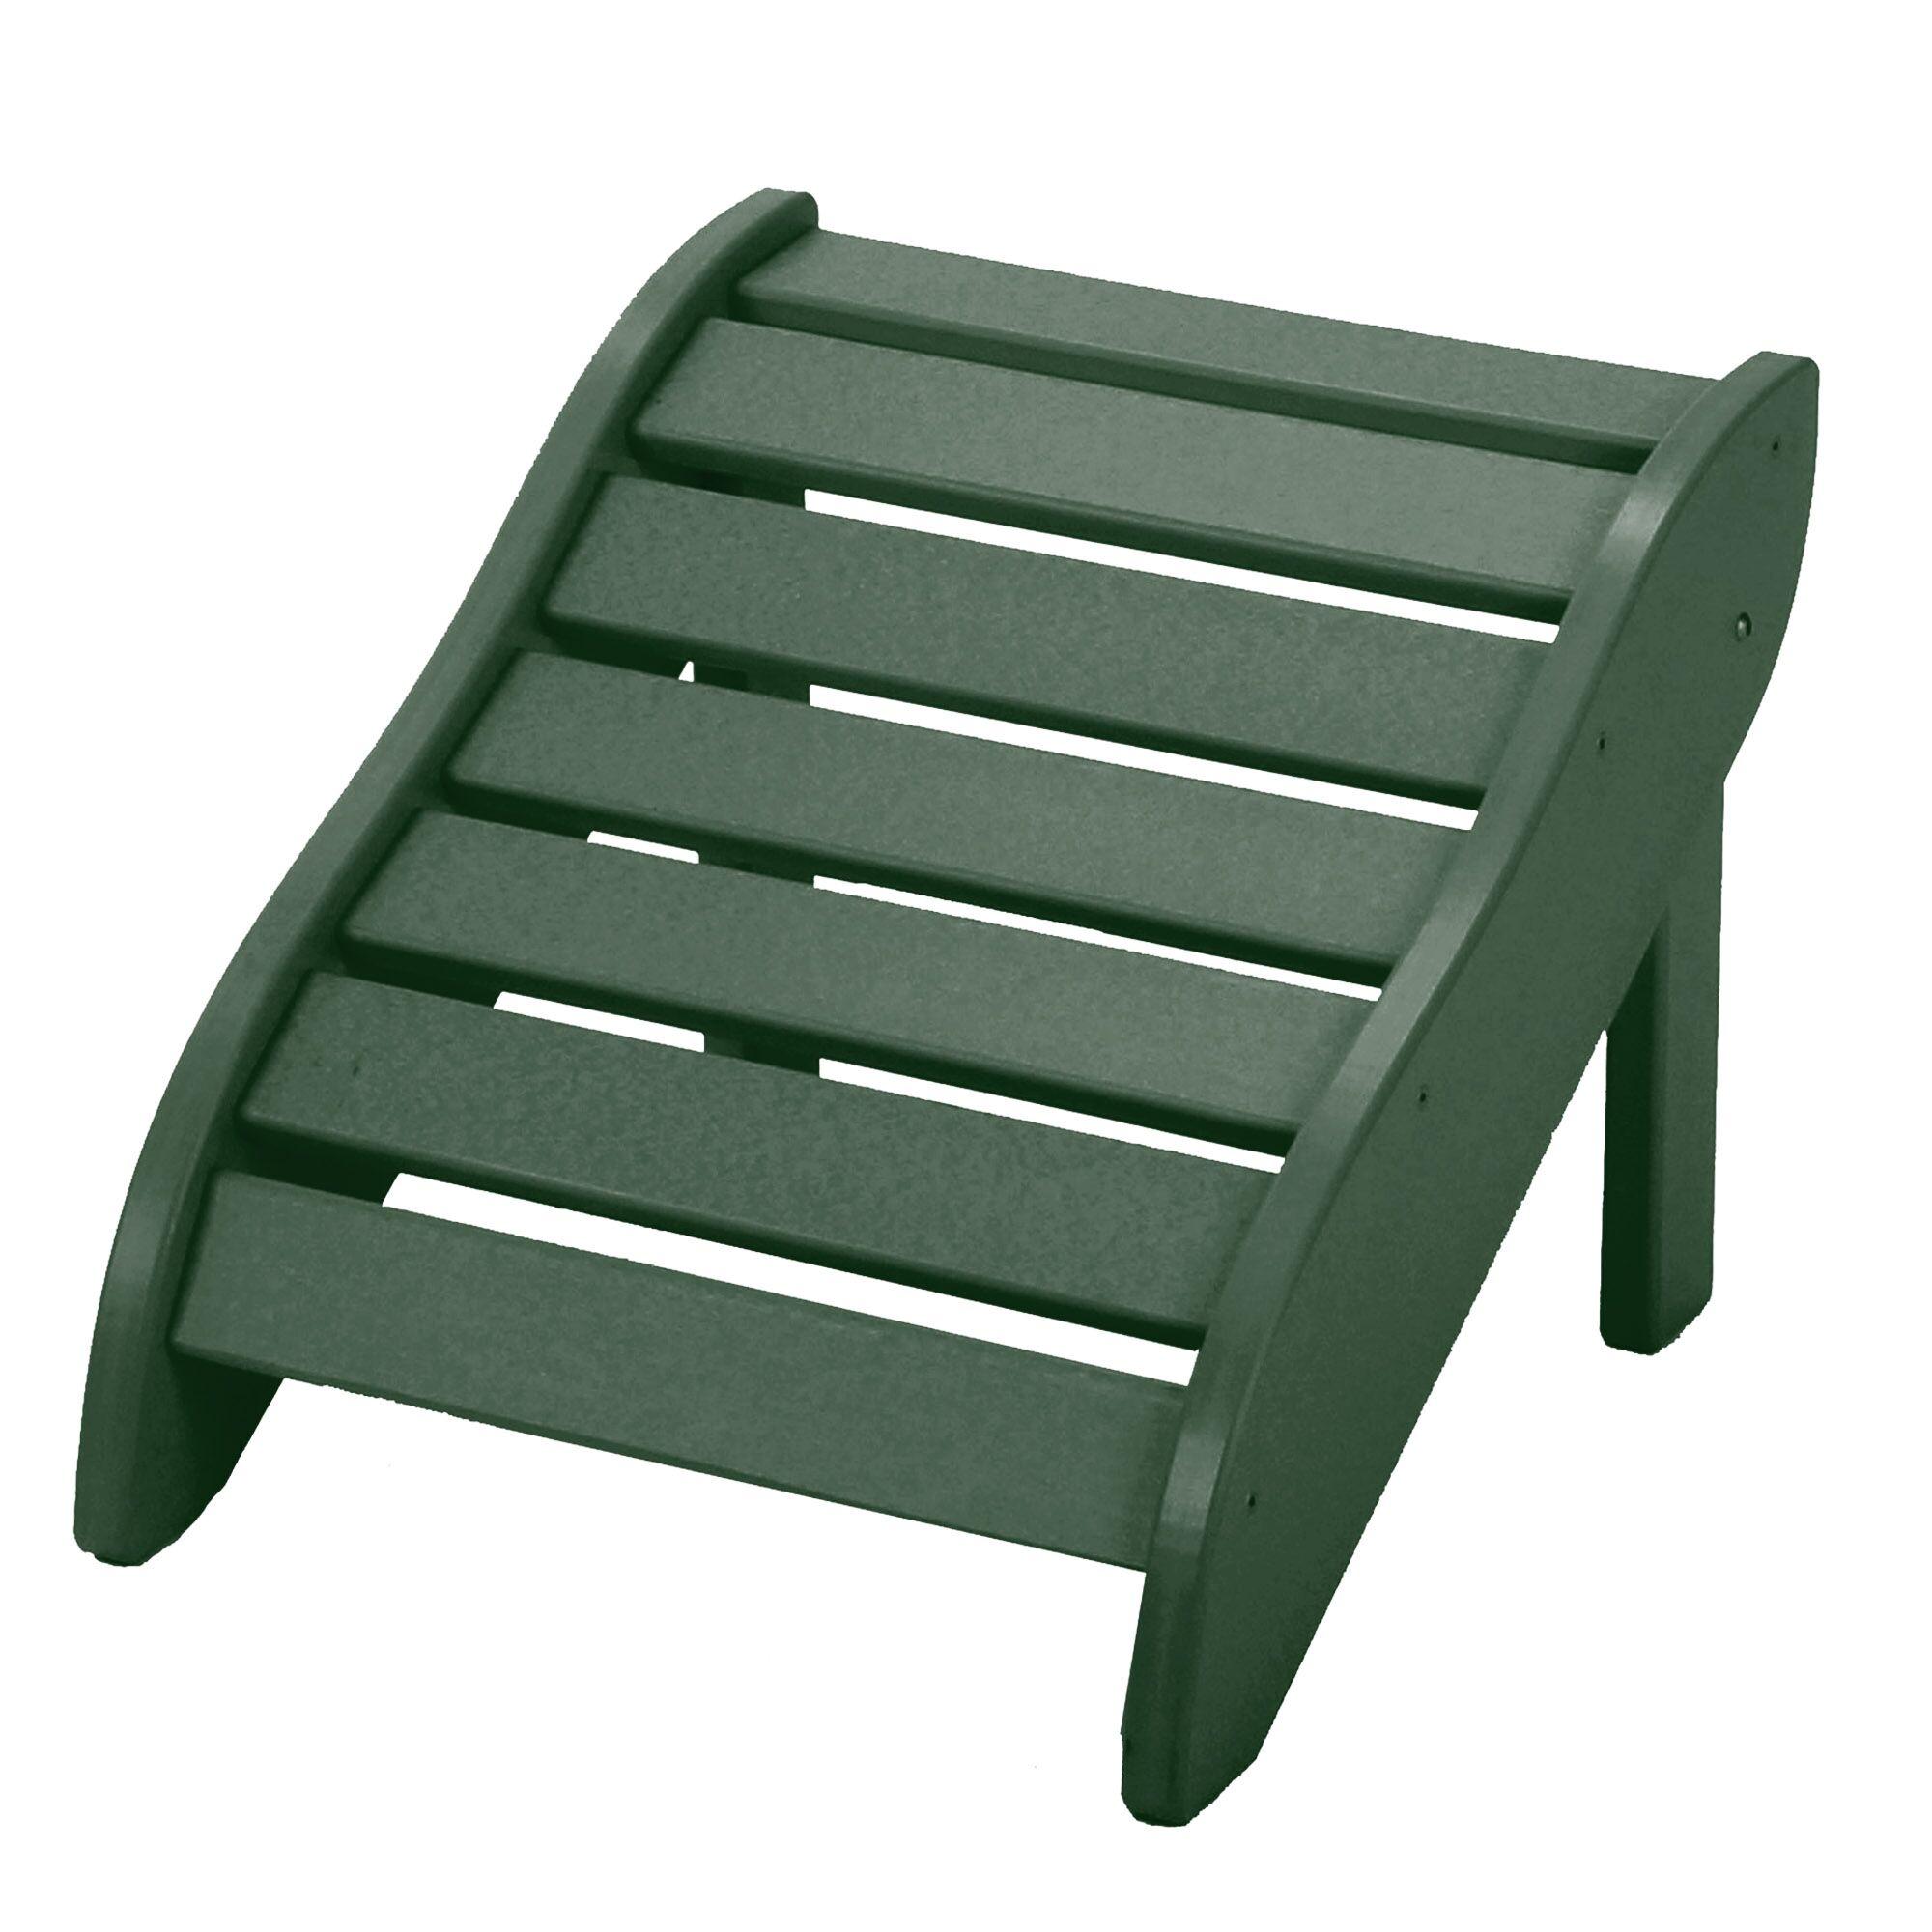 Edgin Foot Rest Color: Pawleys Green